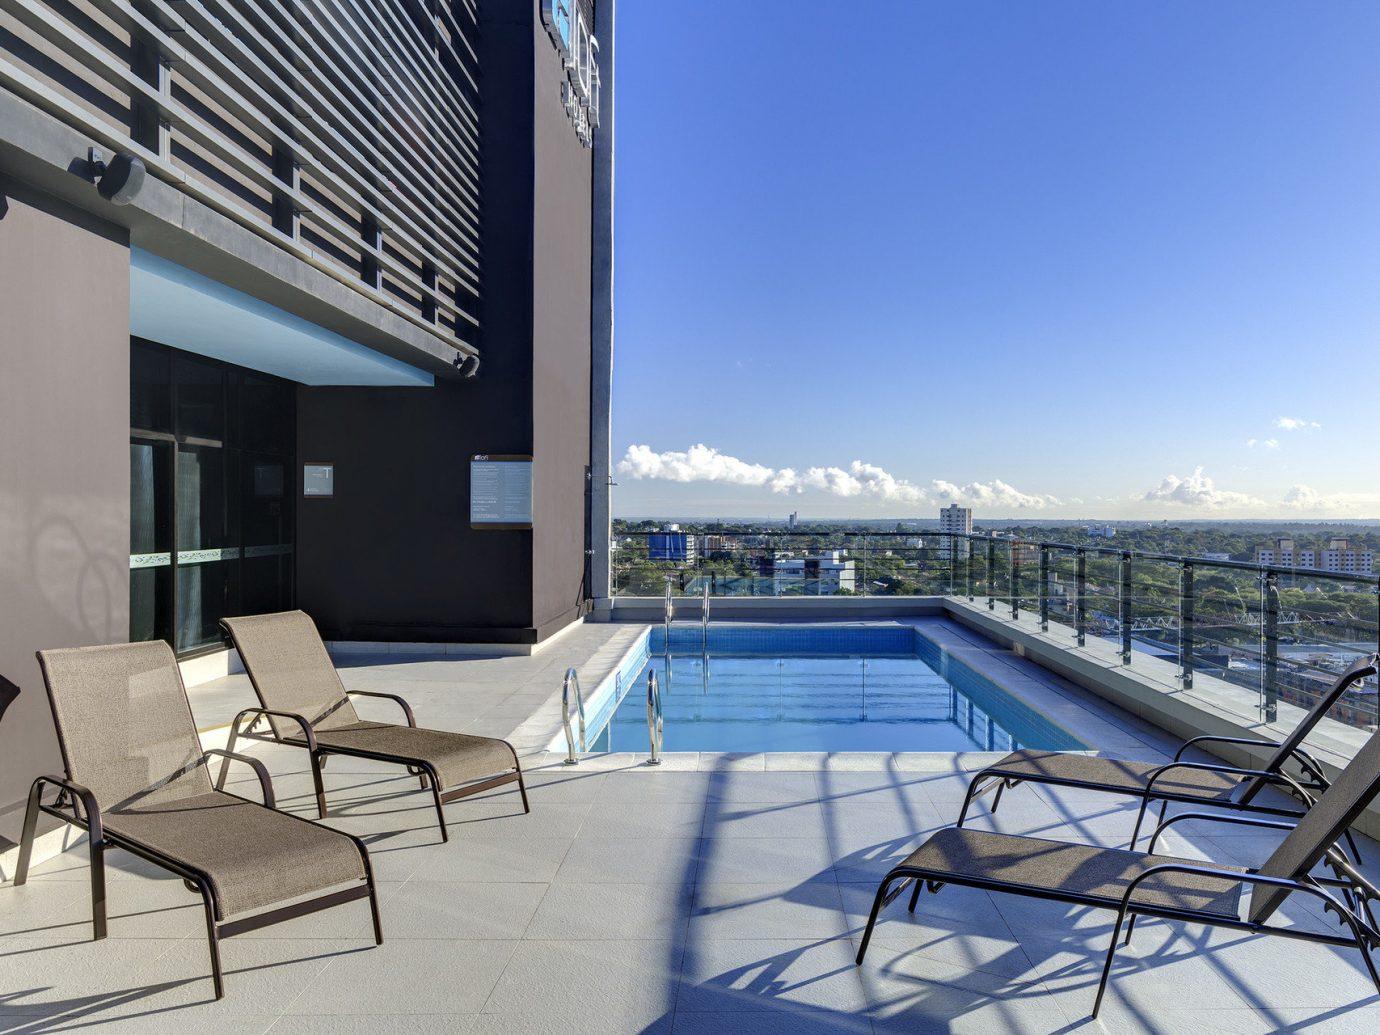 Hotels sky property condominium estate Villa real estate swimming pool apartment Resort overlooking